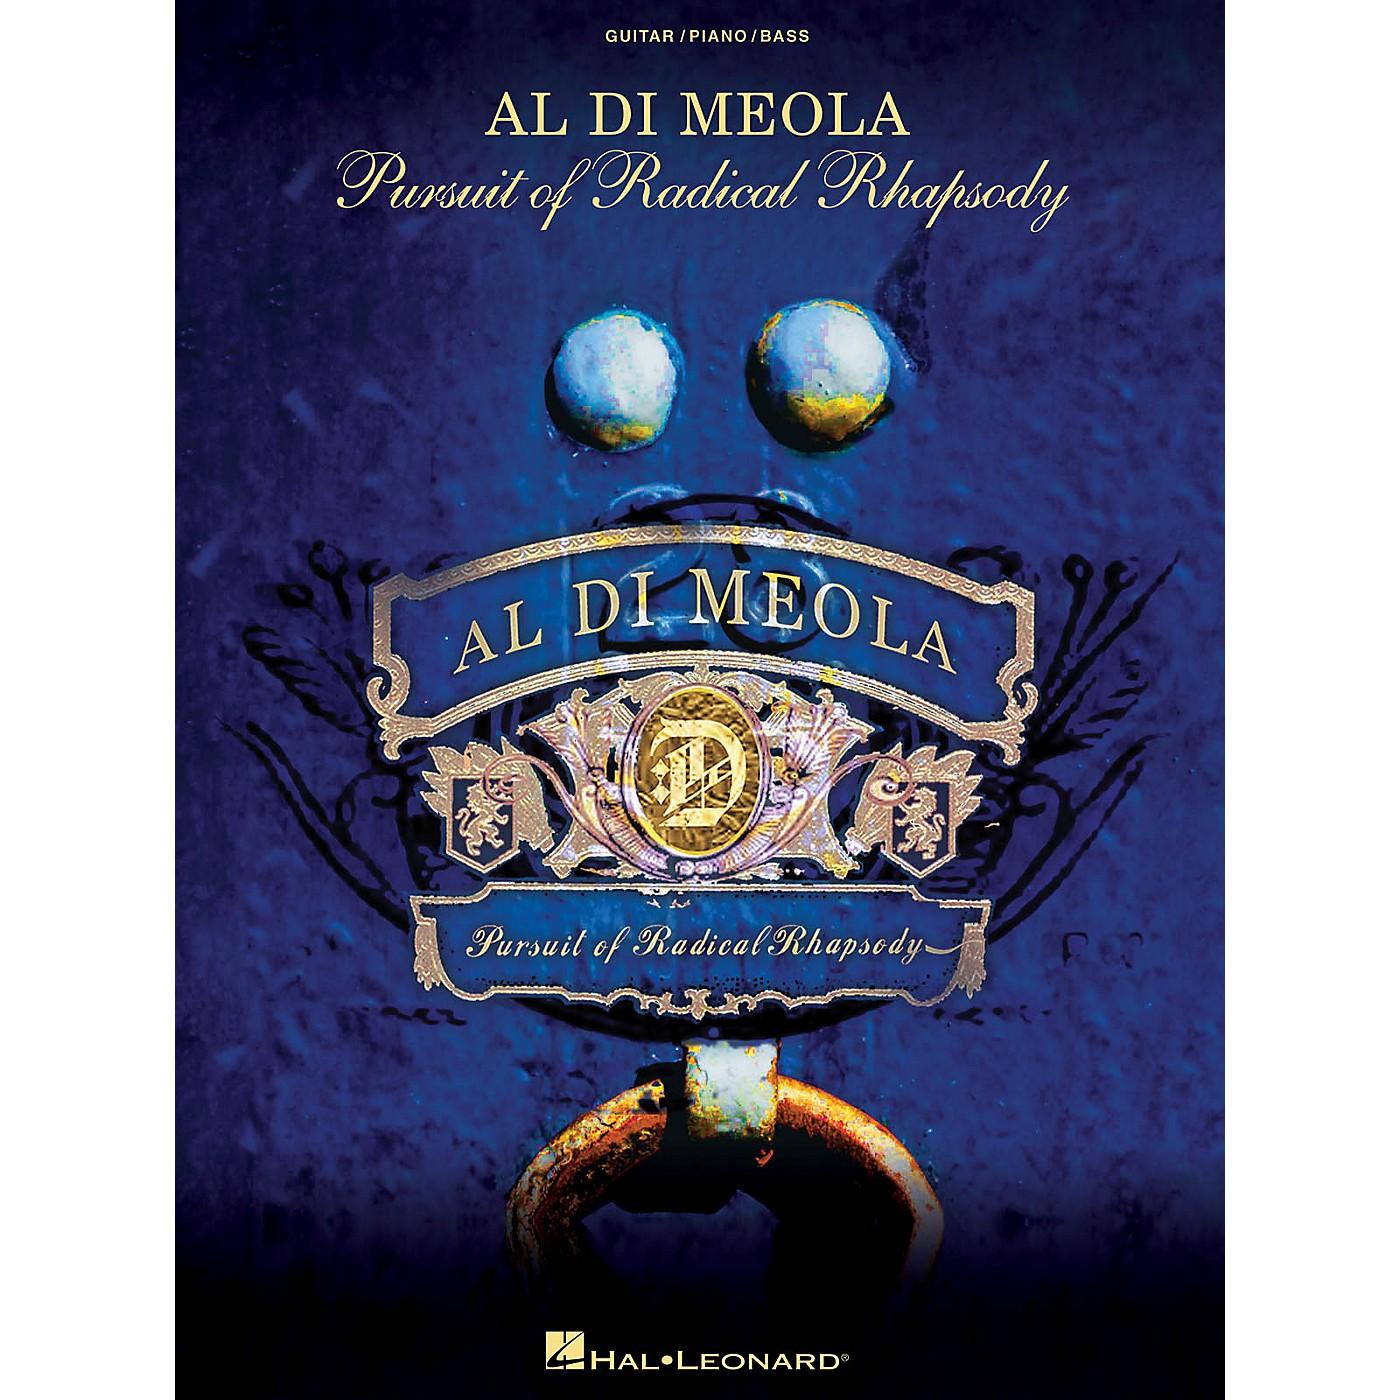 Hal Leonard Al Di Meola - Pursuit of Radical Rhapsody Artist Books Series Softcover Performed by Al Di Meola thumbnail